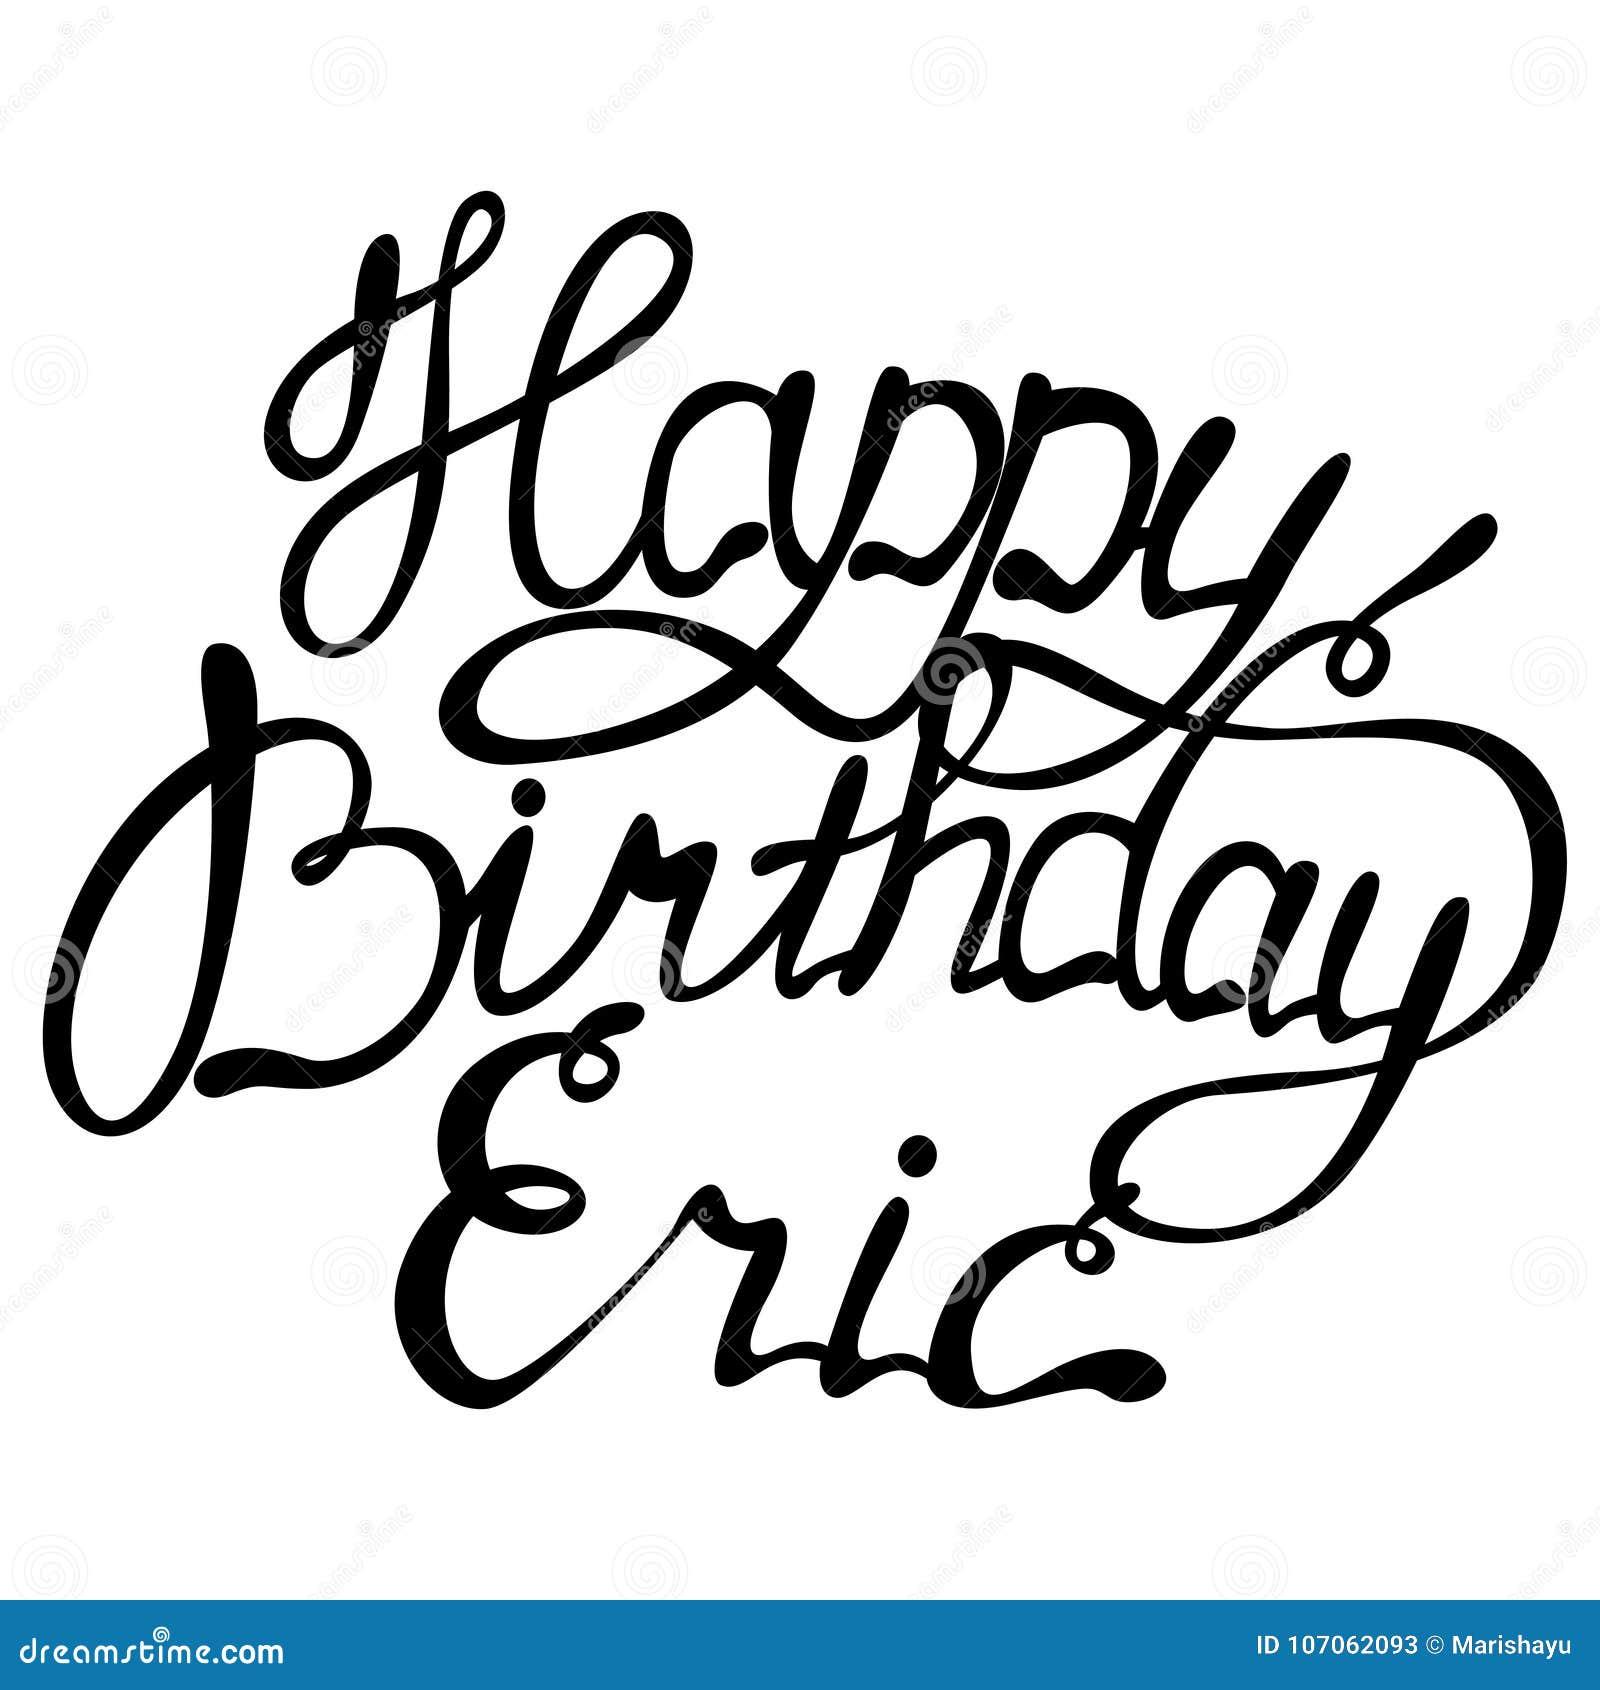 Anniversaire Eric.Eric Name Stock Illustrations 16 Eric Name Stock